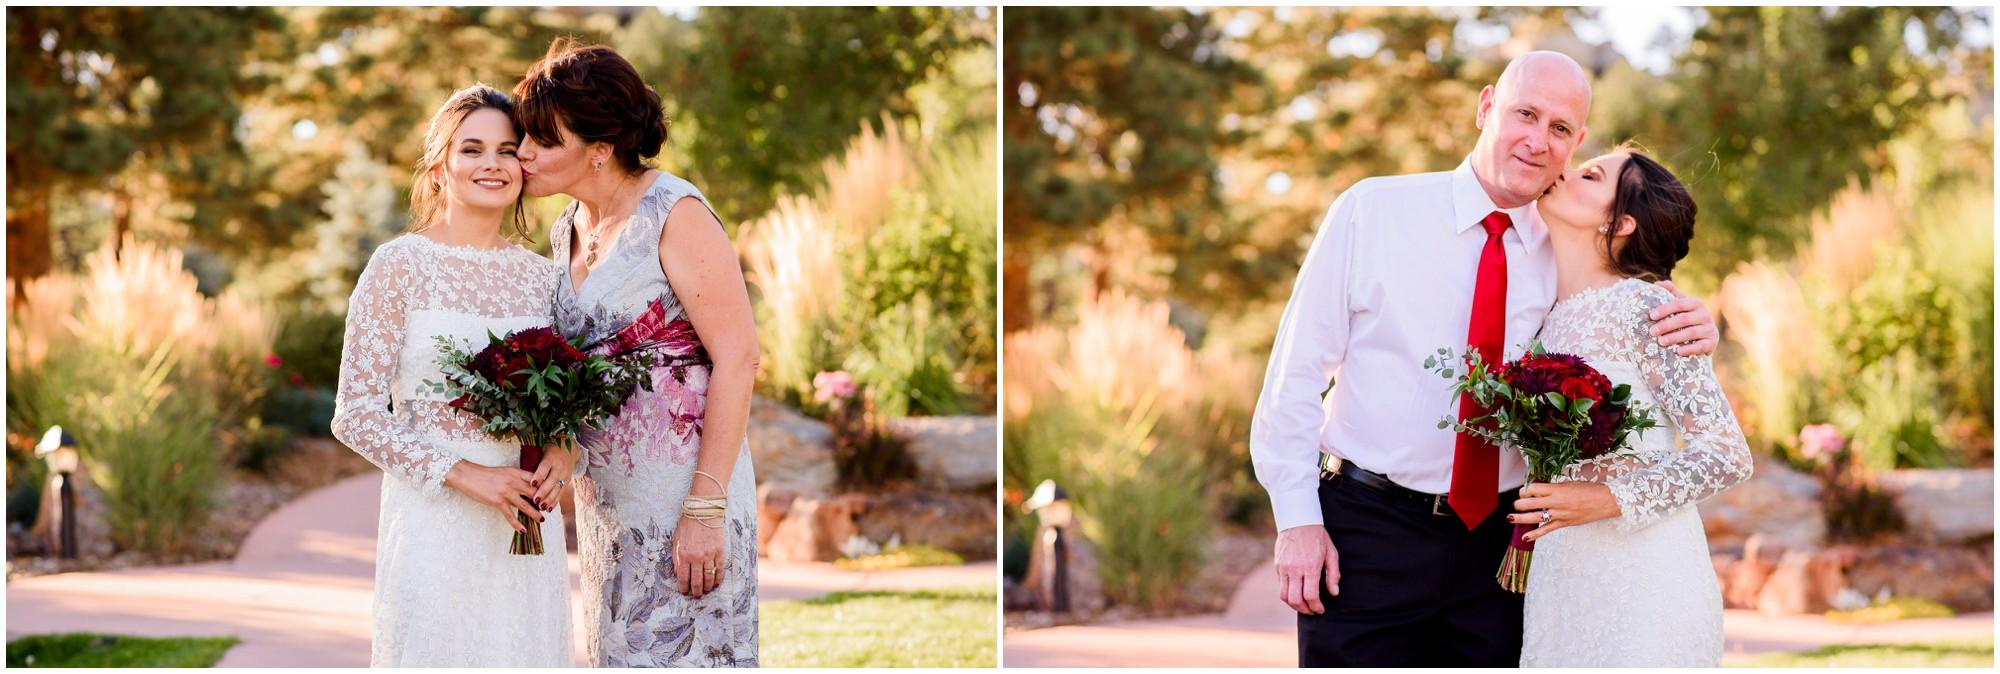 140-Estes-Park-Stanley-hotel-fall-wedding.jpg